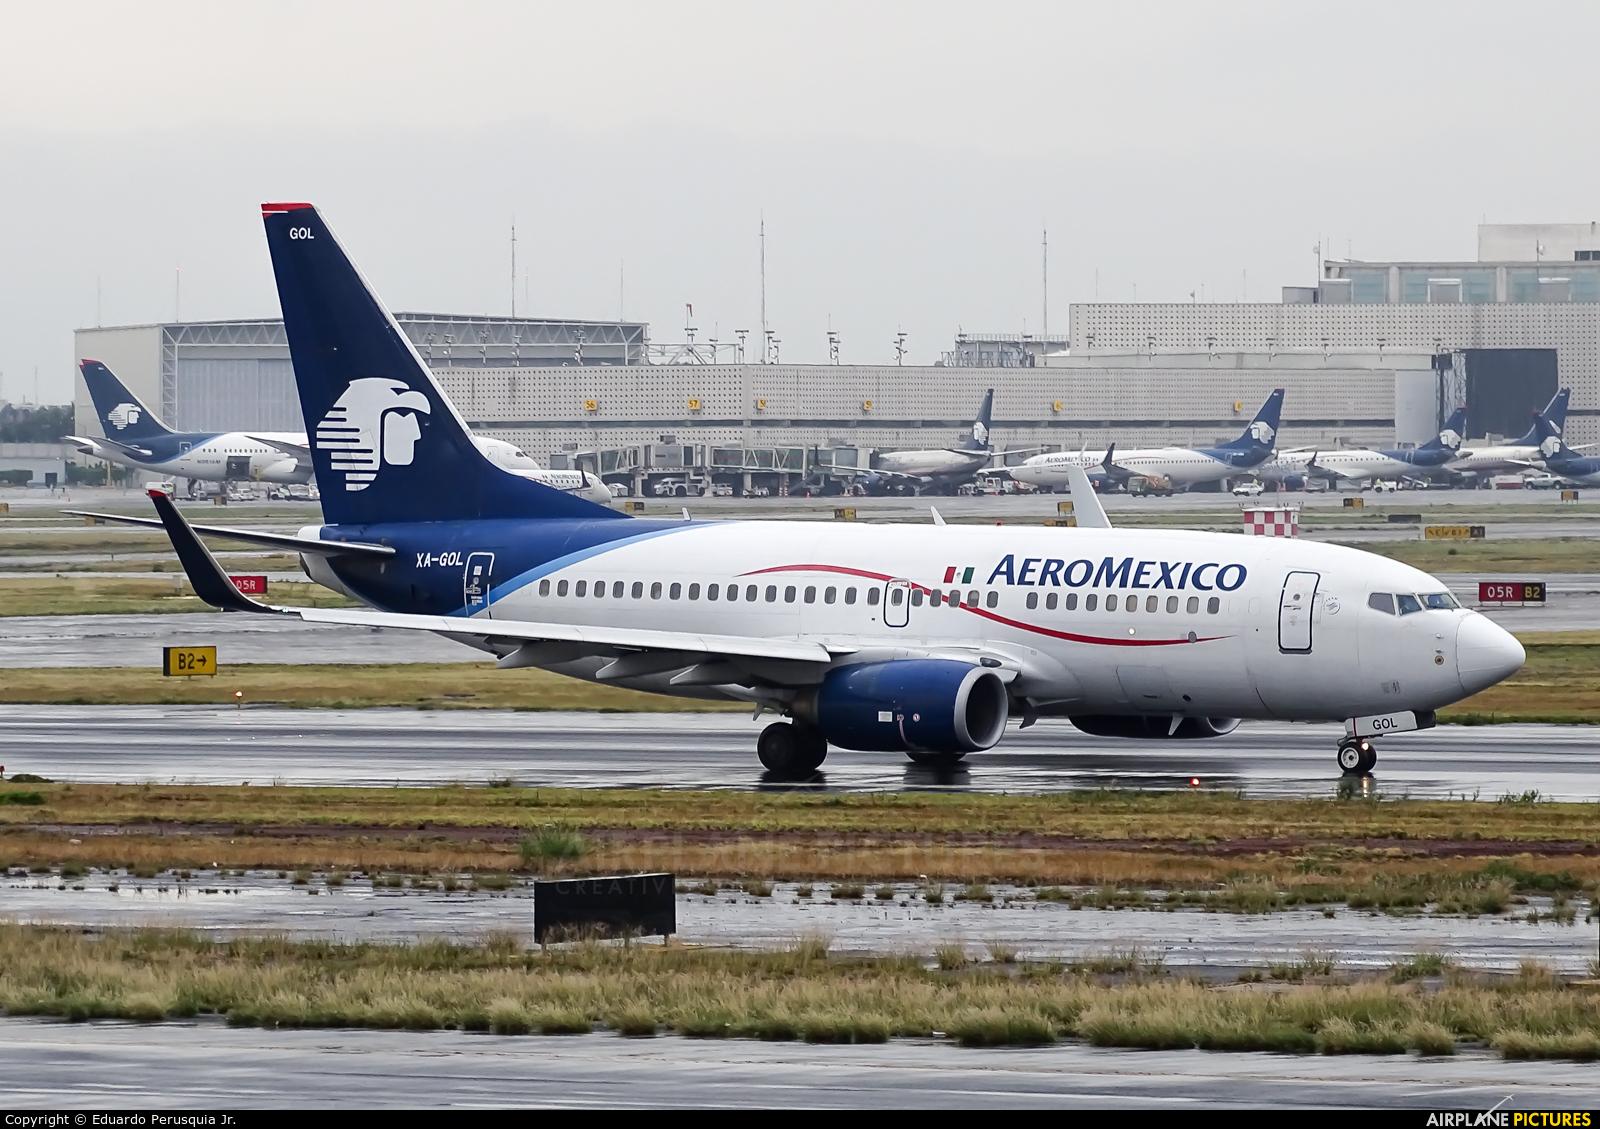 Aeromexico Boeing 737-700 at Ciudad Juarez on Jul 5th 2017